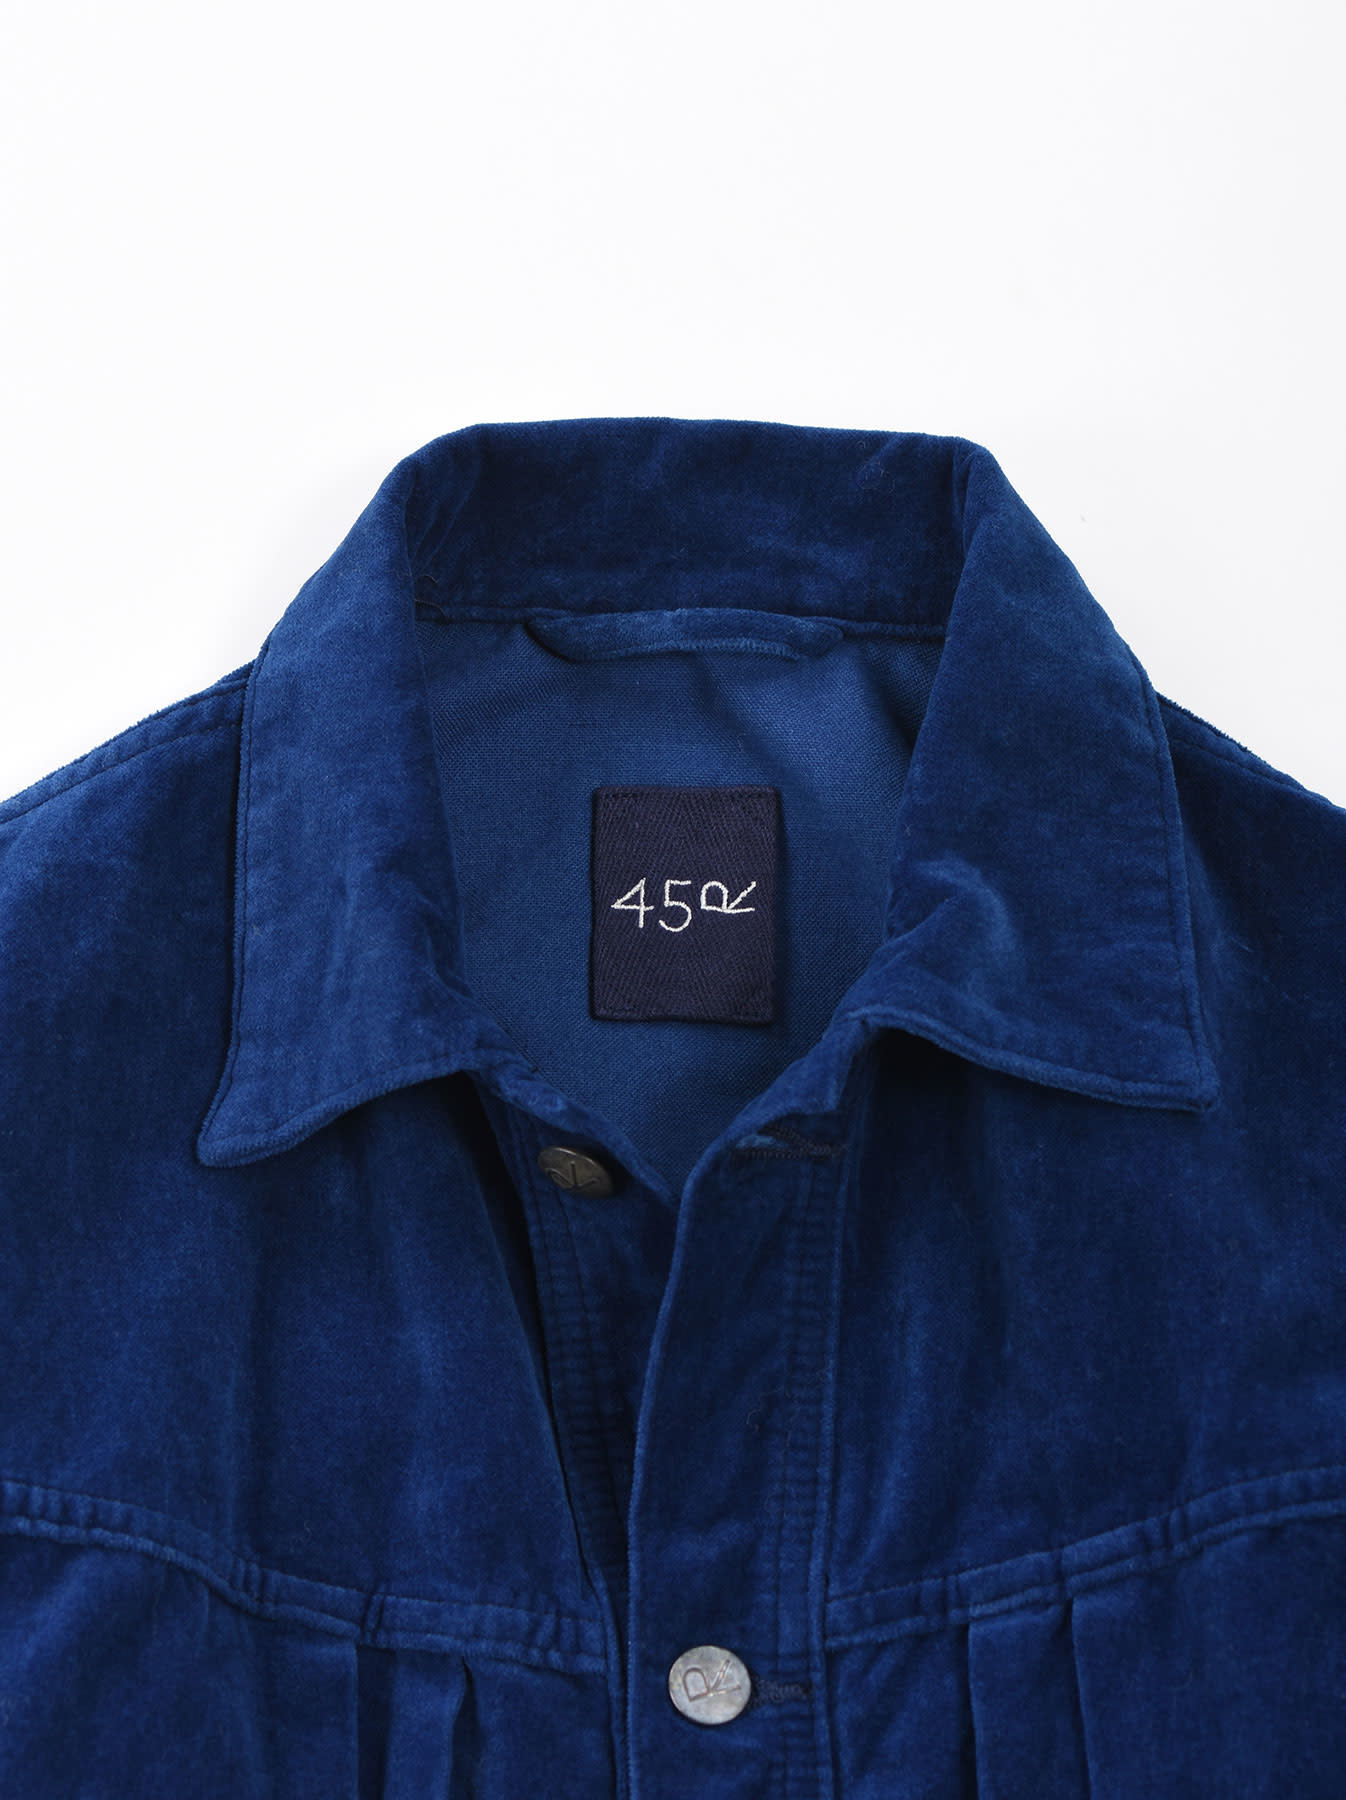 Indigo Velveteen 908 Denim Jacket-9